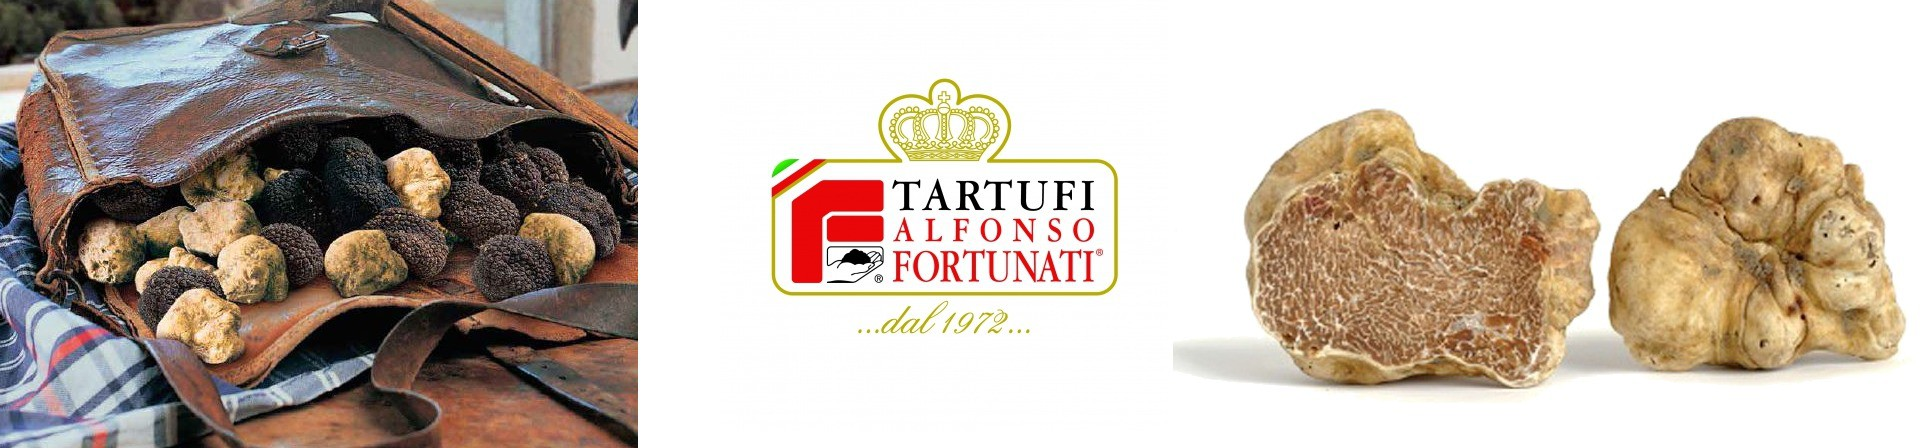 Tartufi freschi dell'Umbria - Alfonso Fortunati - vendita online